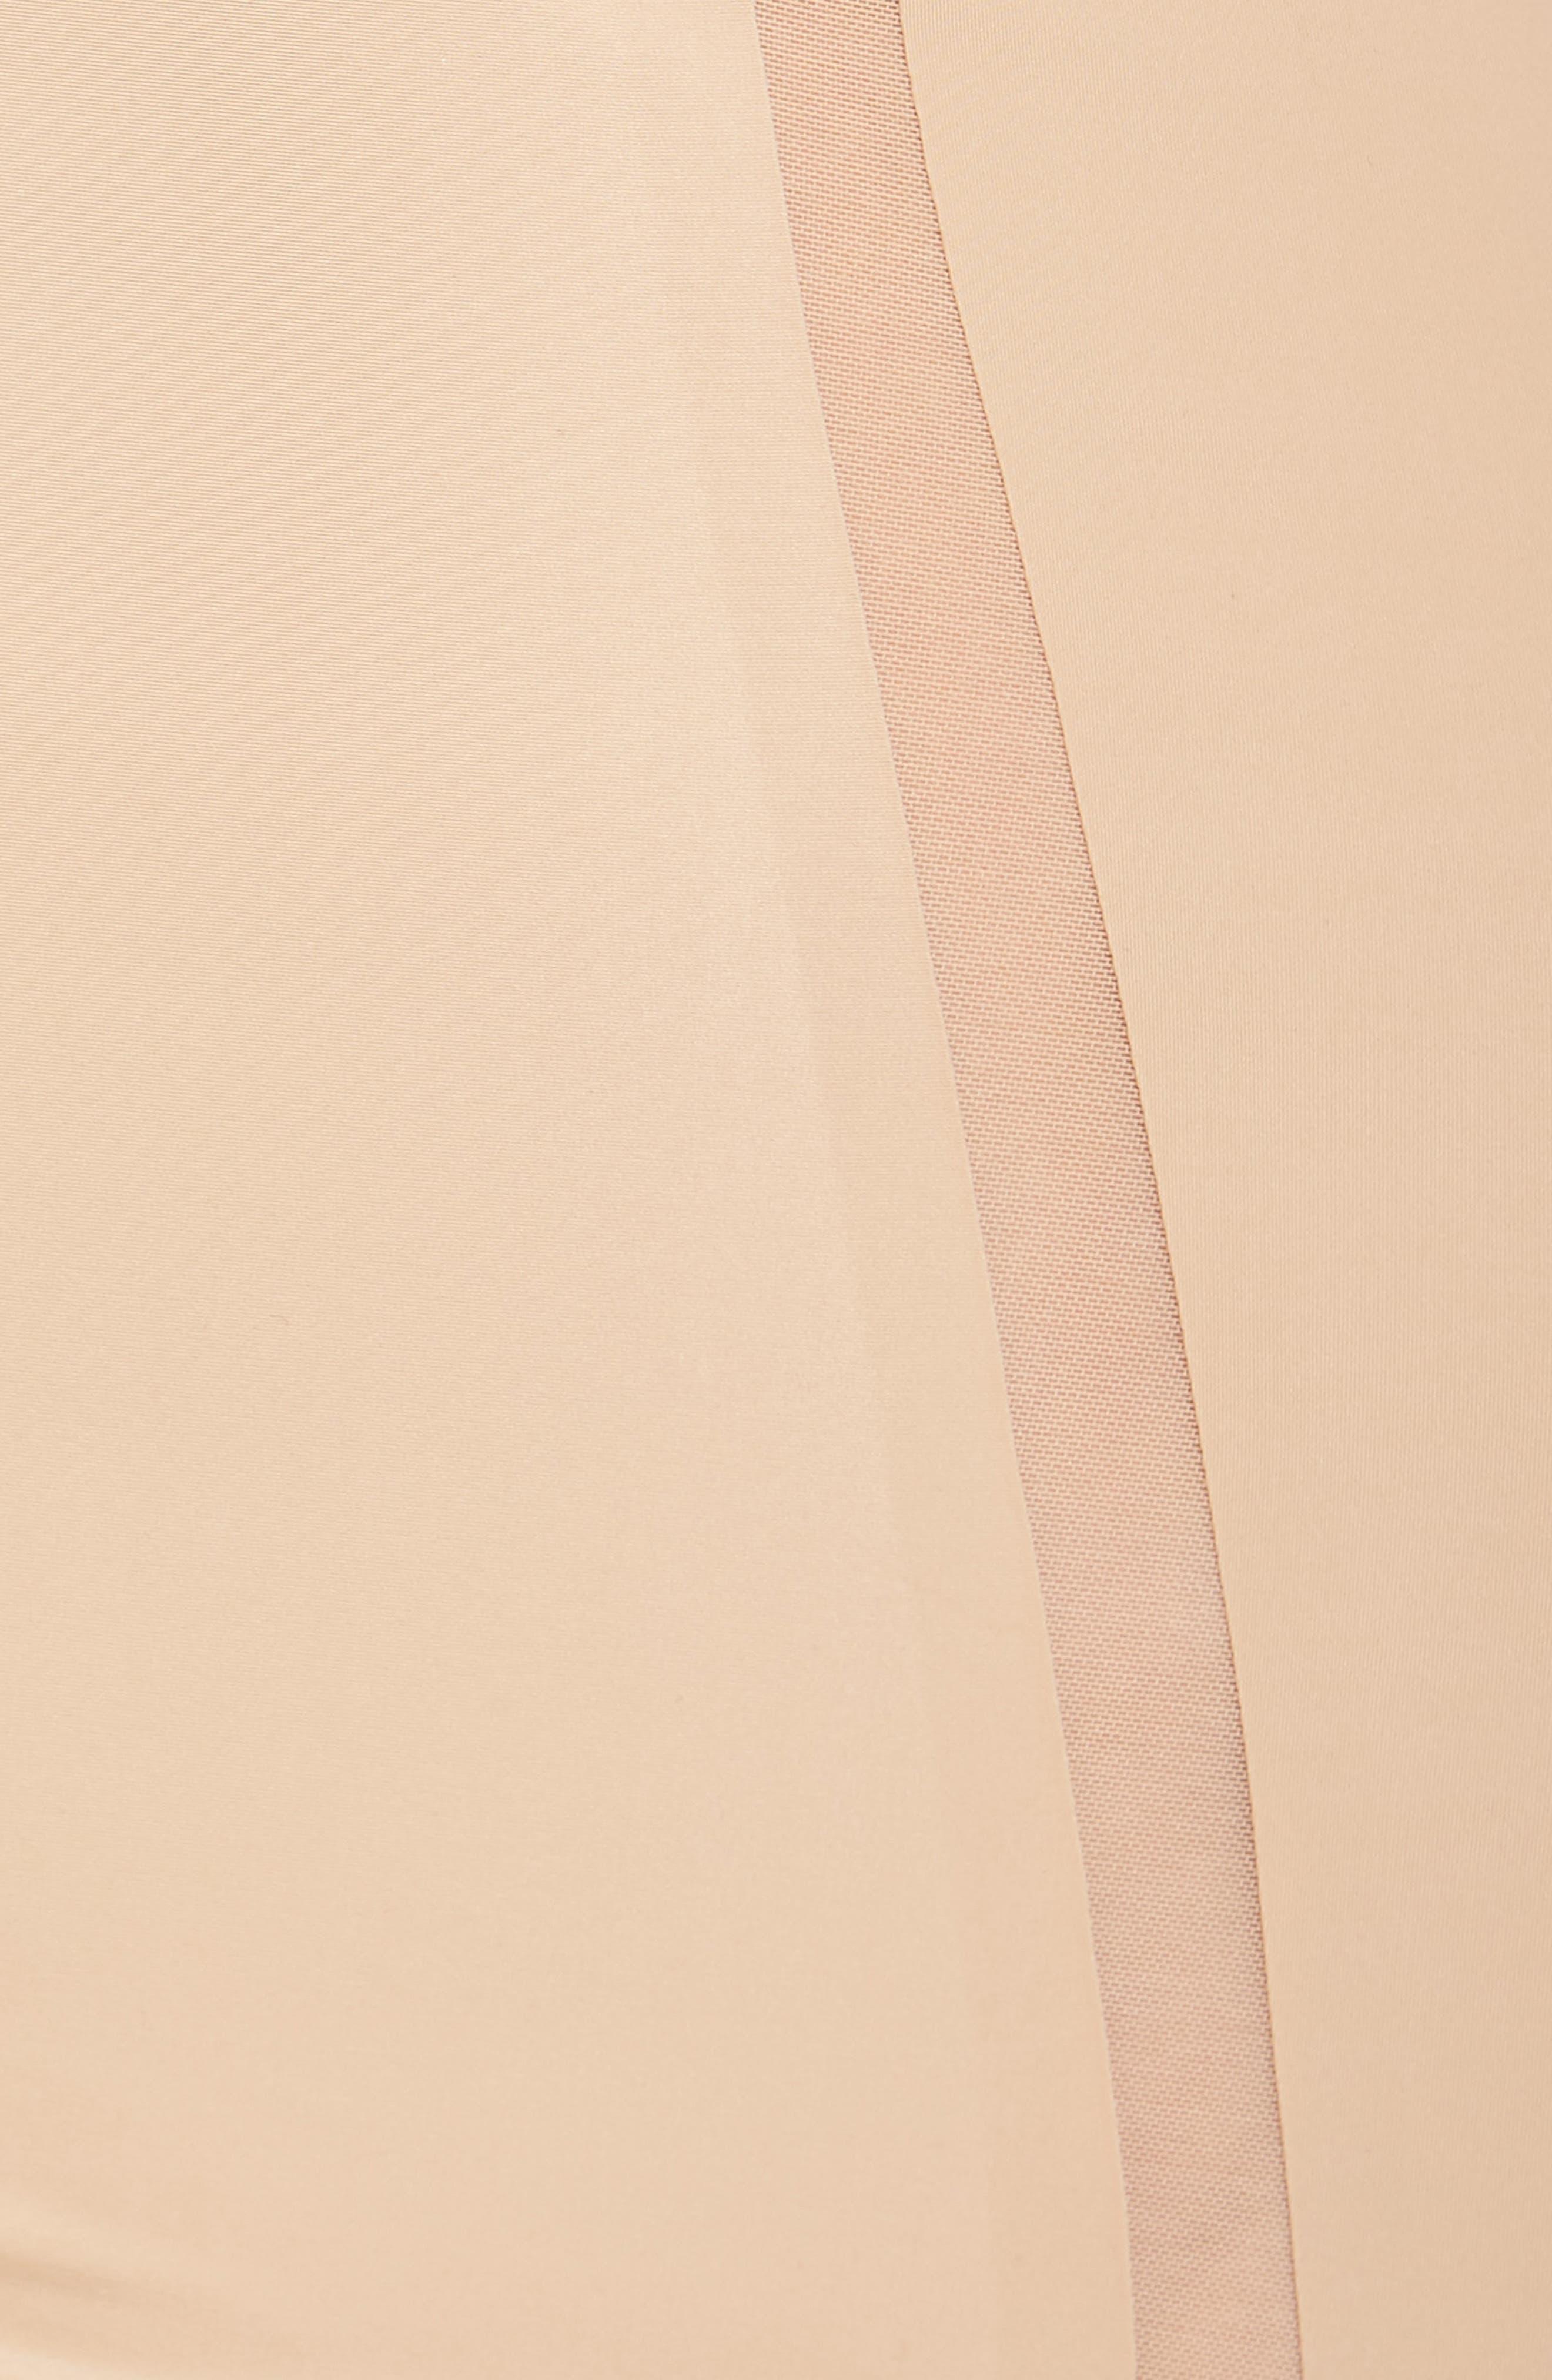 Sculpted Shapewear Slip,                             Alternate thumbnail 7, color,                             Bare